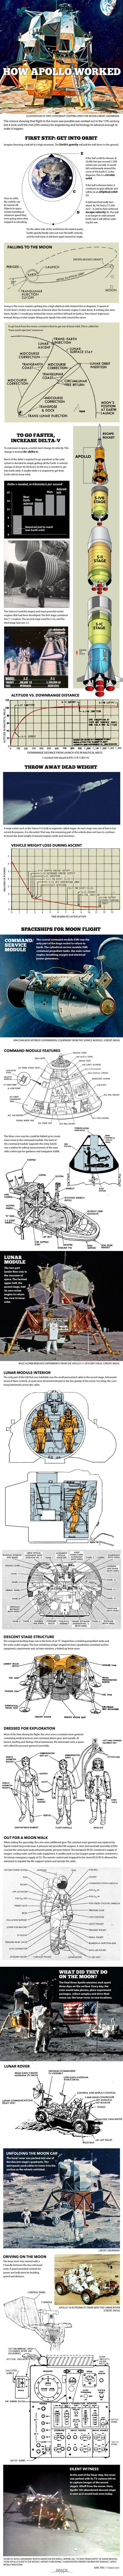 Diagrams and NASA artwork show how Apollo astronauts flew to the moon.